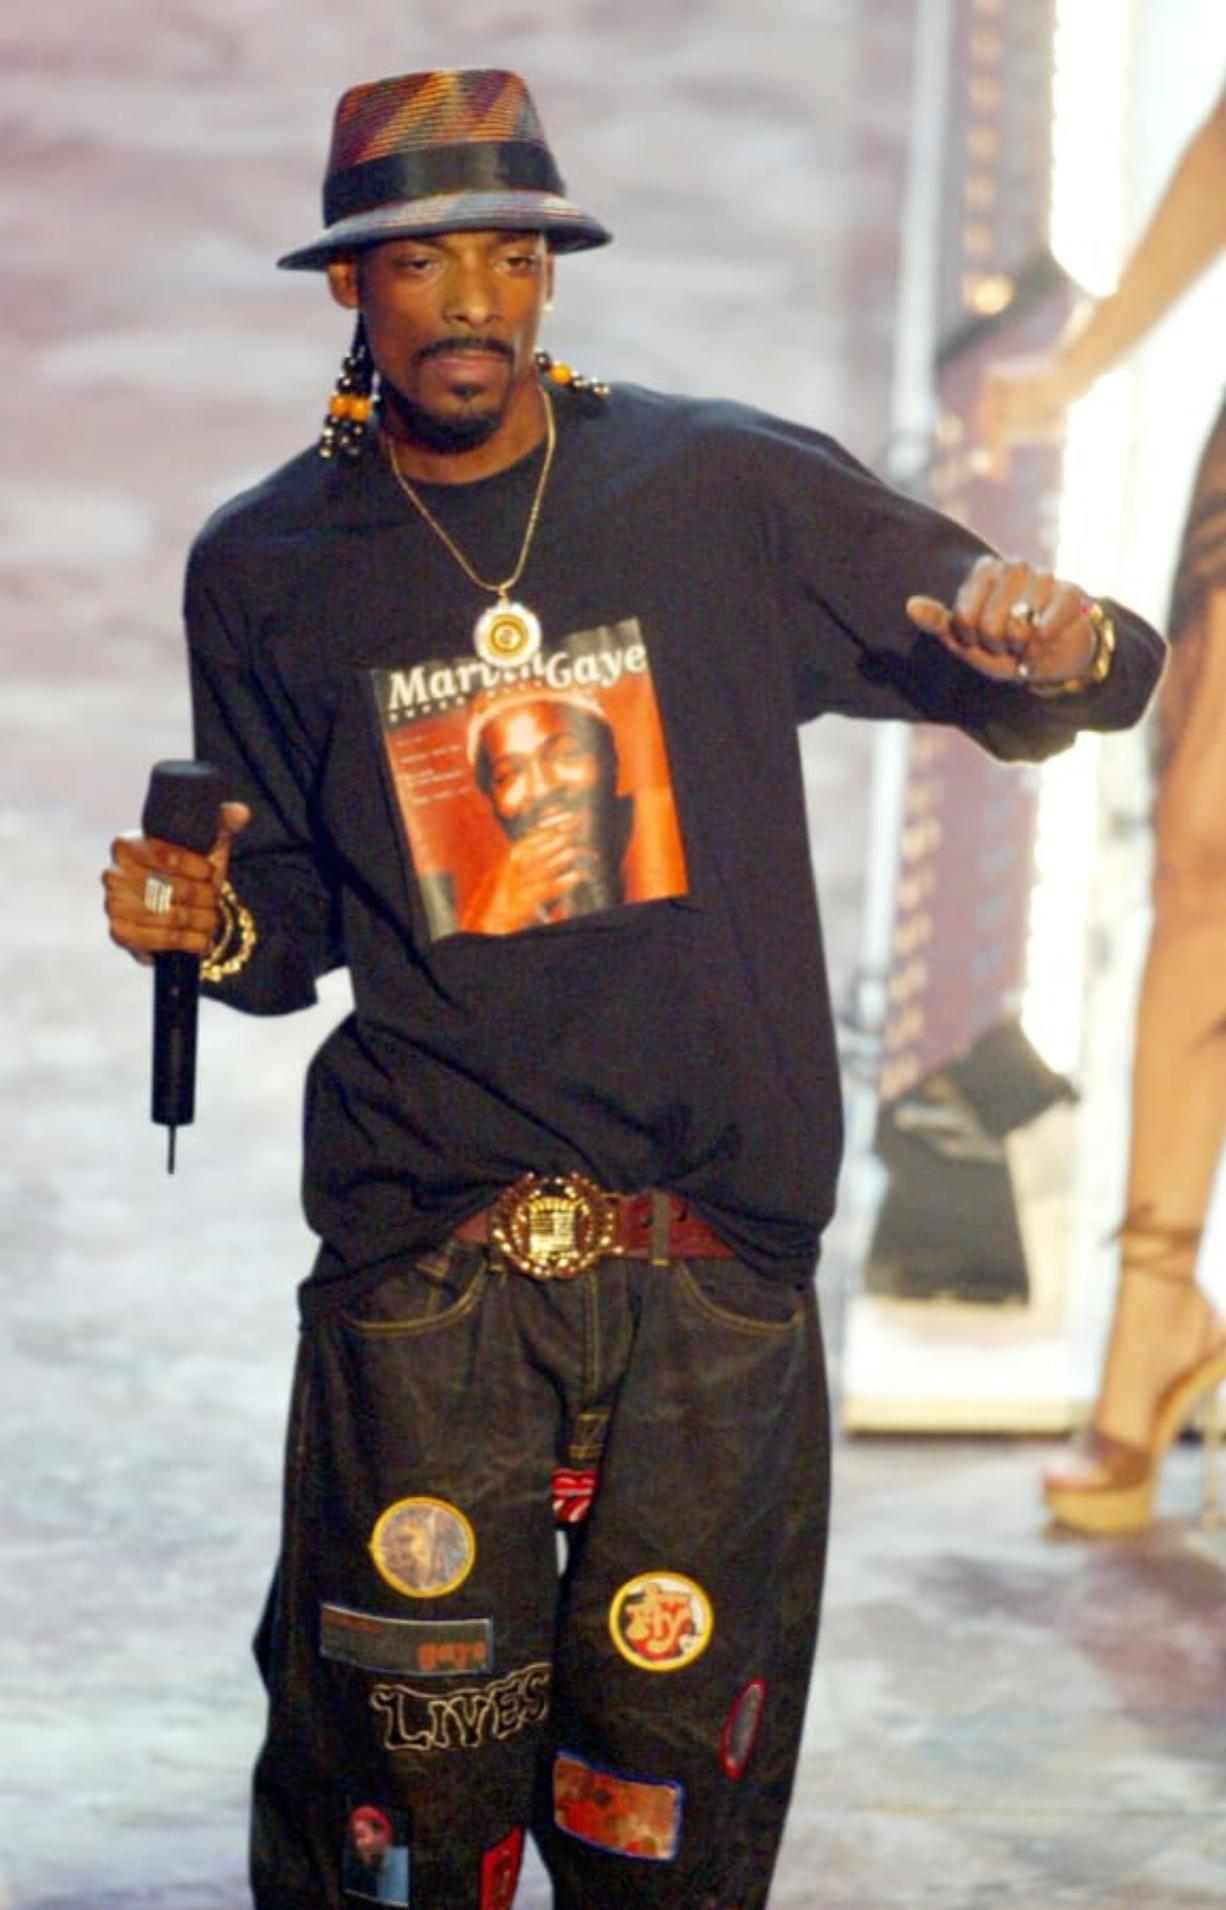 Rap artist Snoop Dogg performs at the 2003 BET Awards.